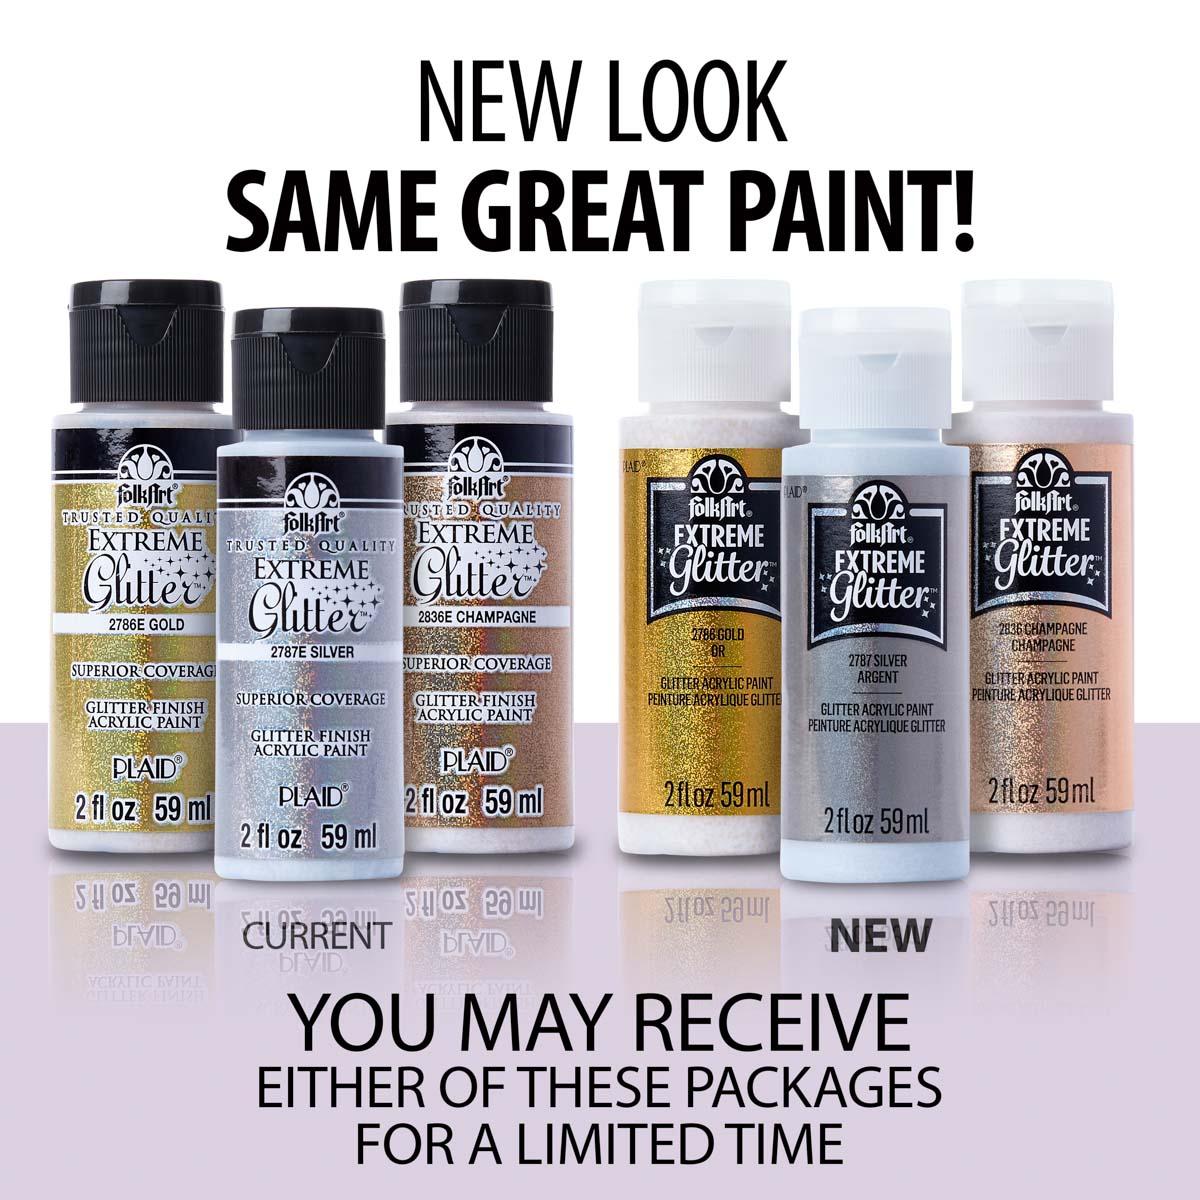 FolkArt ® Extreme Glitter™ - Turquoise, 2 oz. - 2790